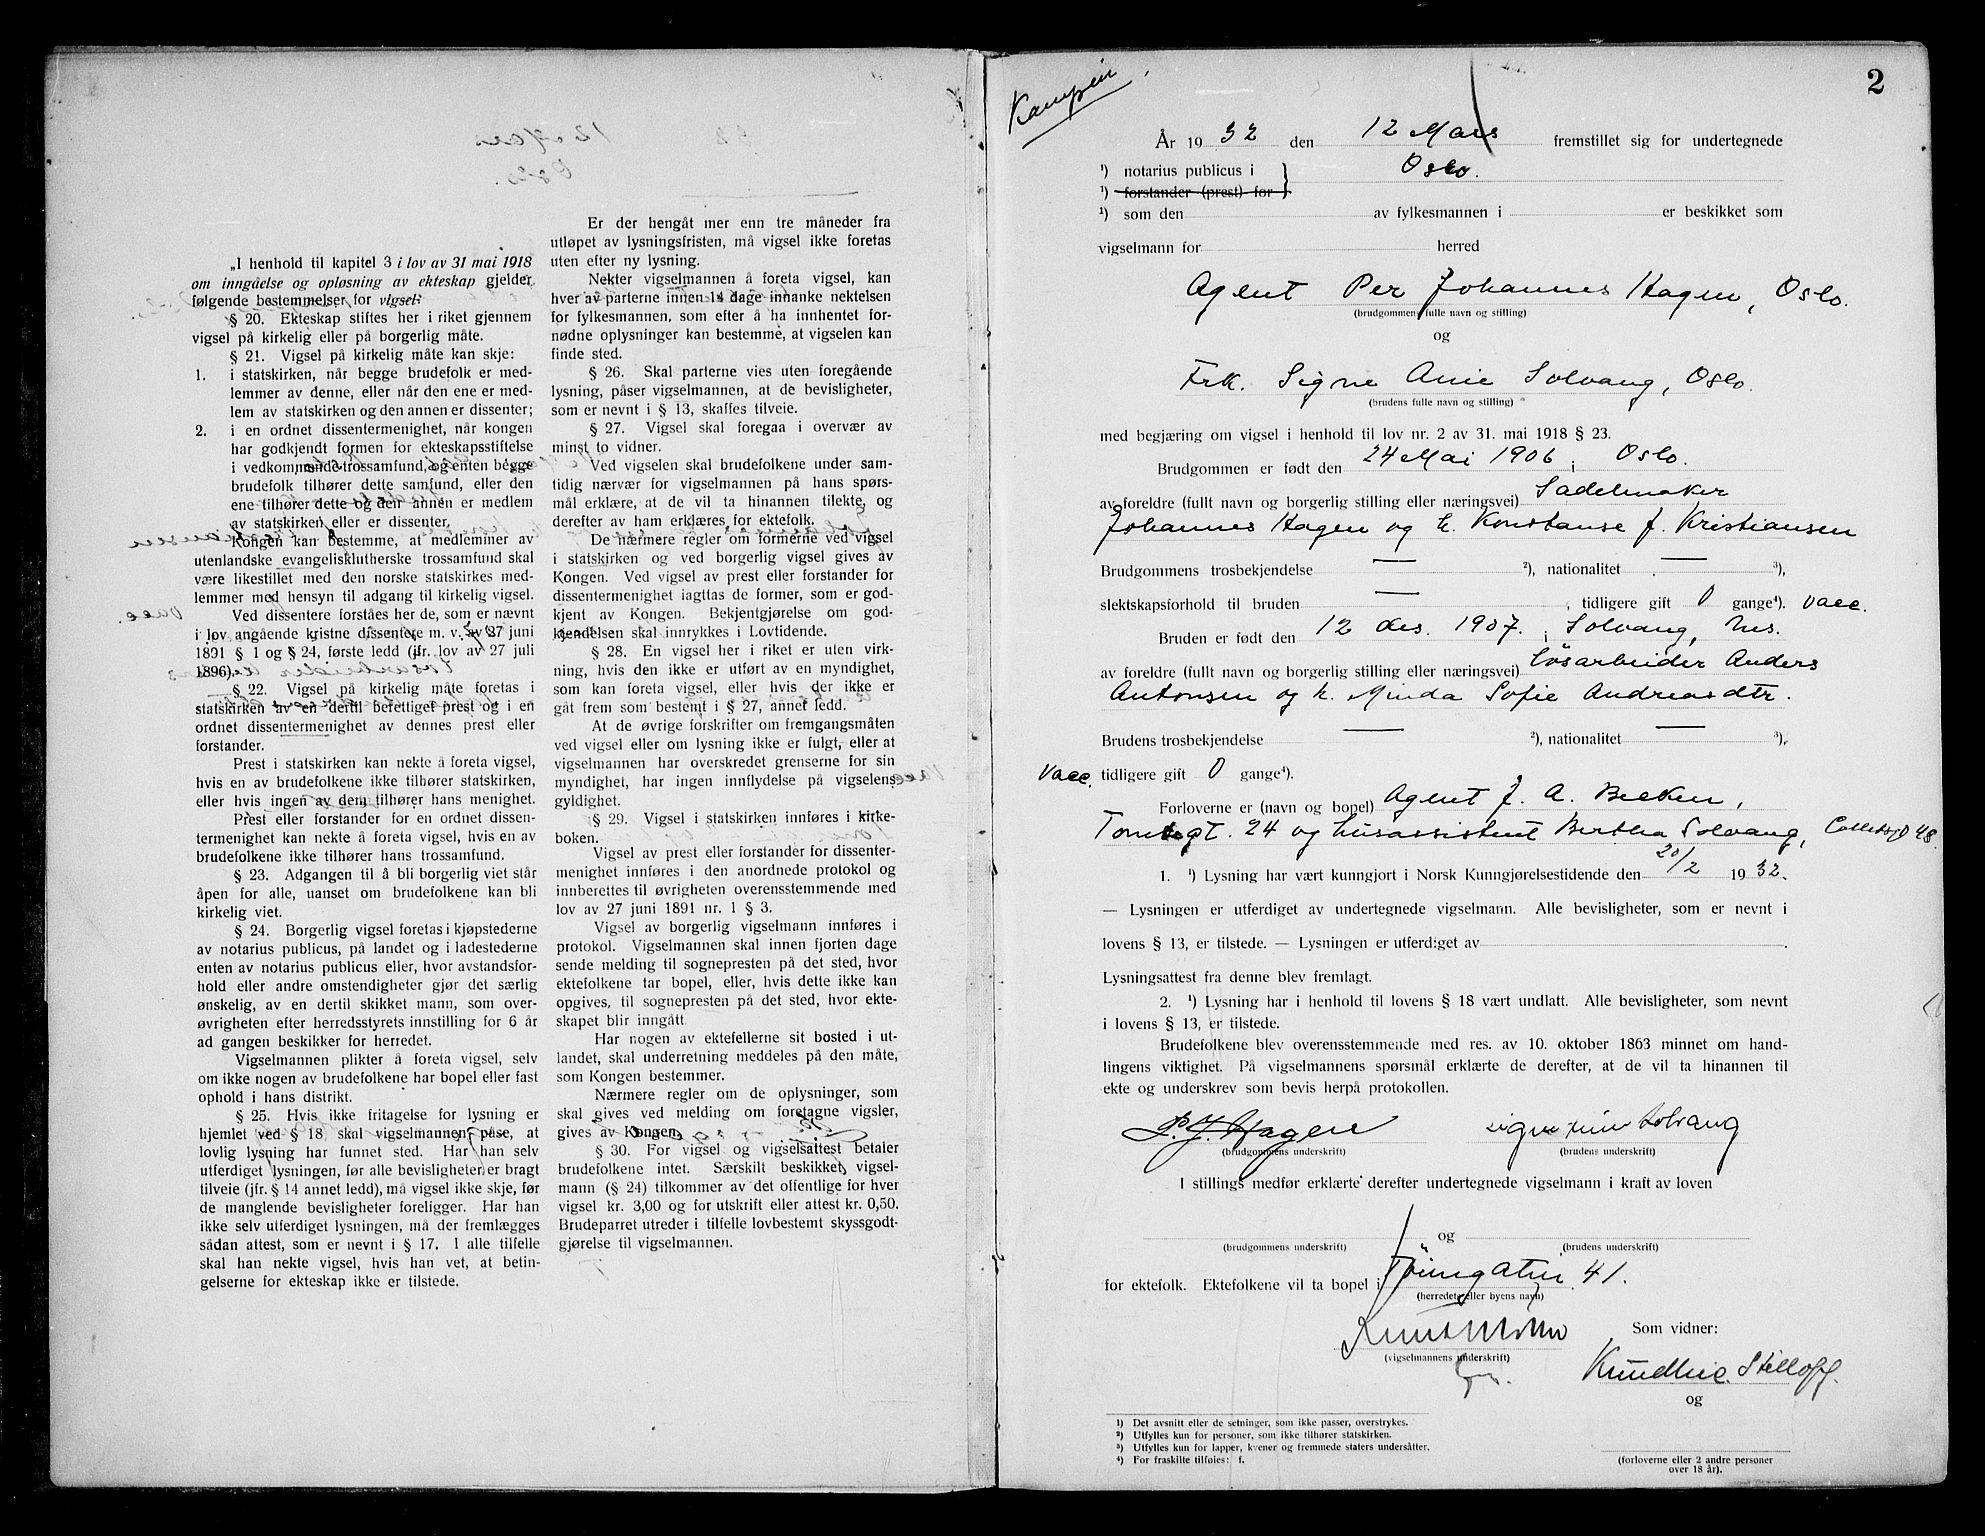 SAO, Oslo byfogd avd. I, L/Lb/Lbb/L0022: Notarialprotokoll, rekke II: Vigsler, 1932-1933, s. 1b-2a